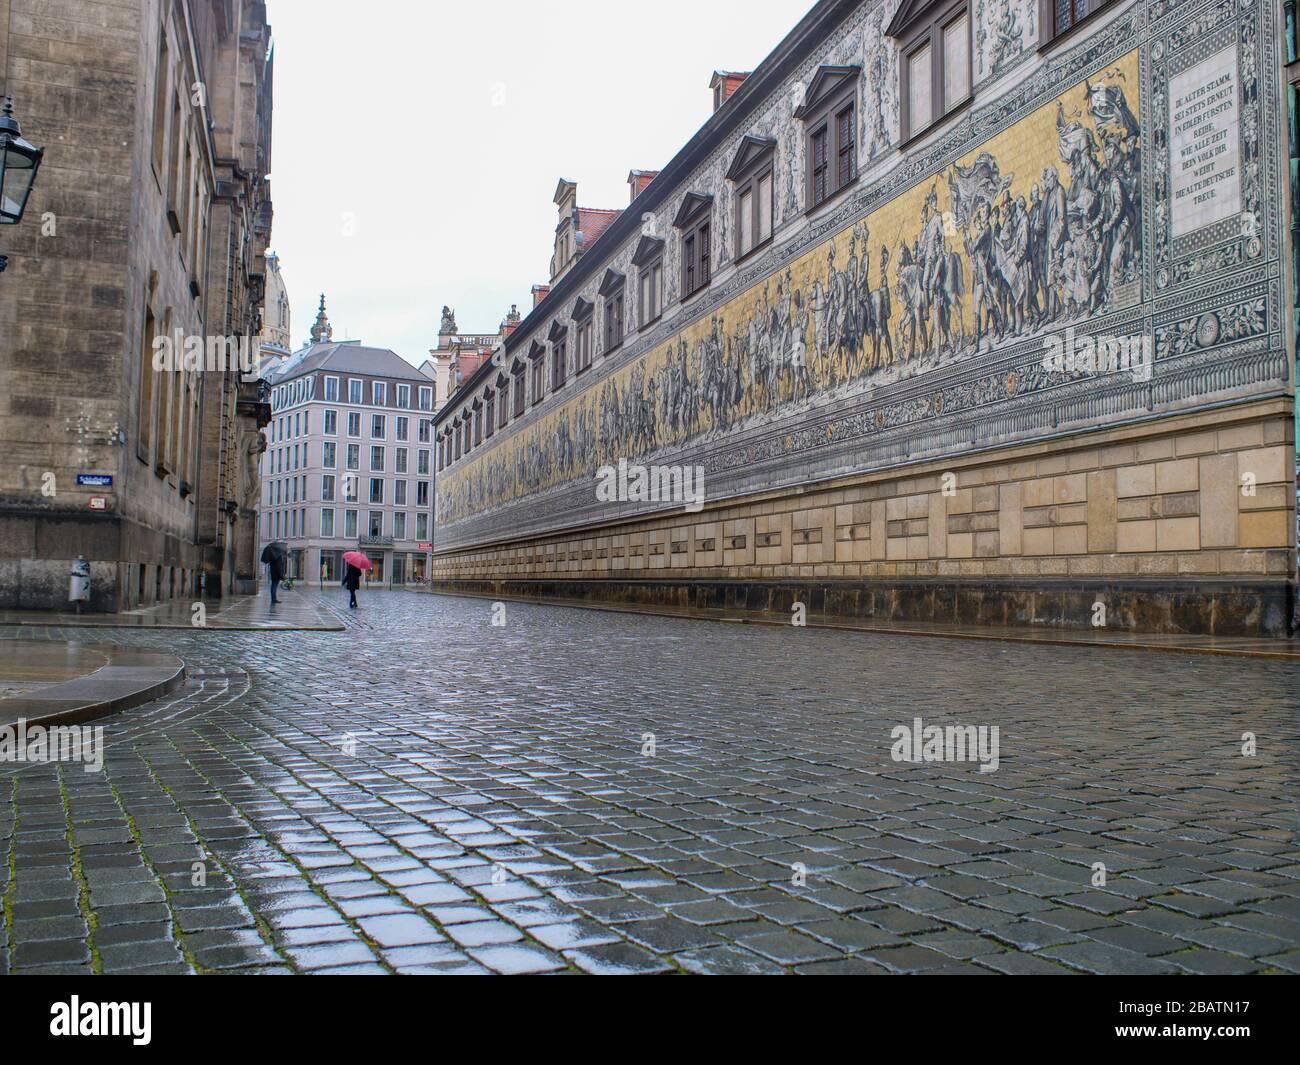 Dresden Fürstenzug am Residenzschloss während Coronavirus Lockdown 2020 bei Regen Foto de stock